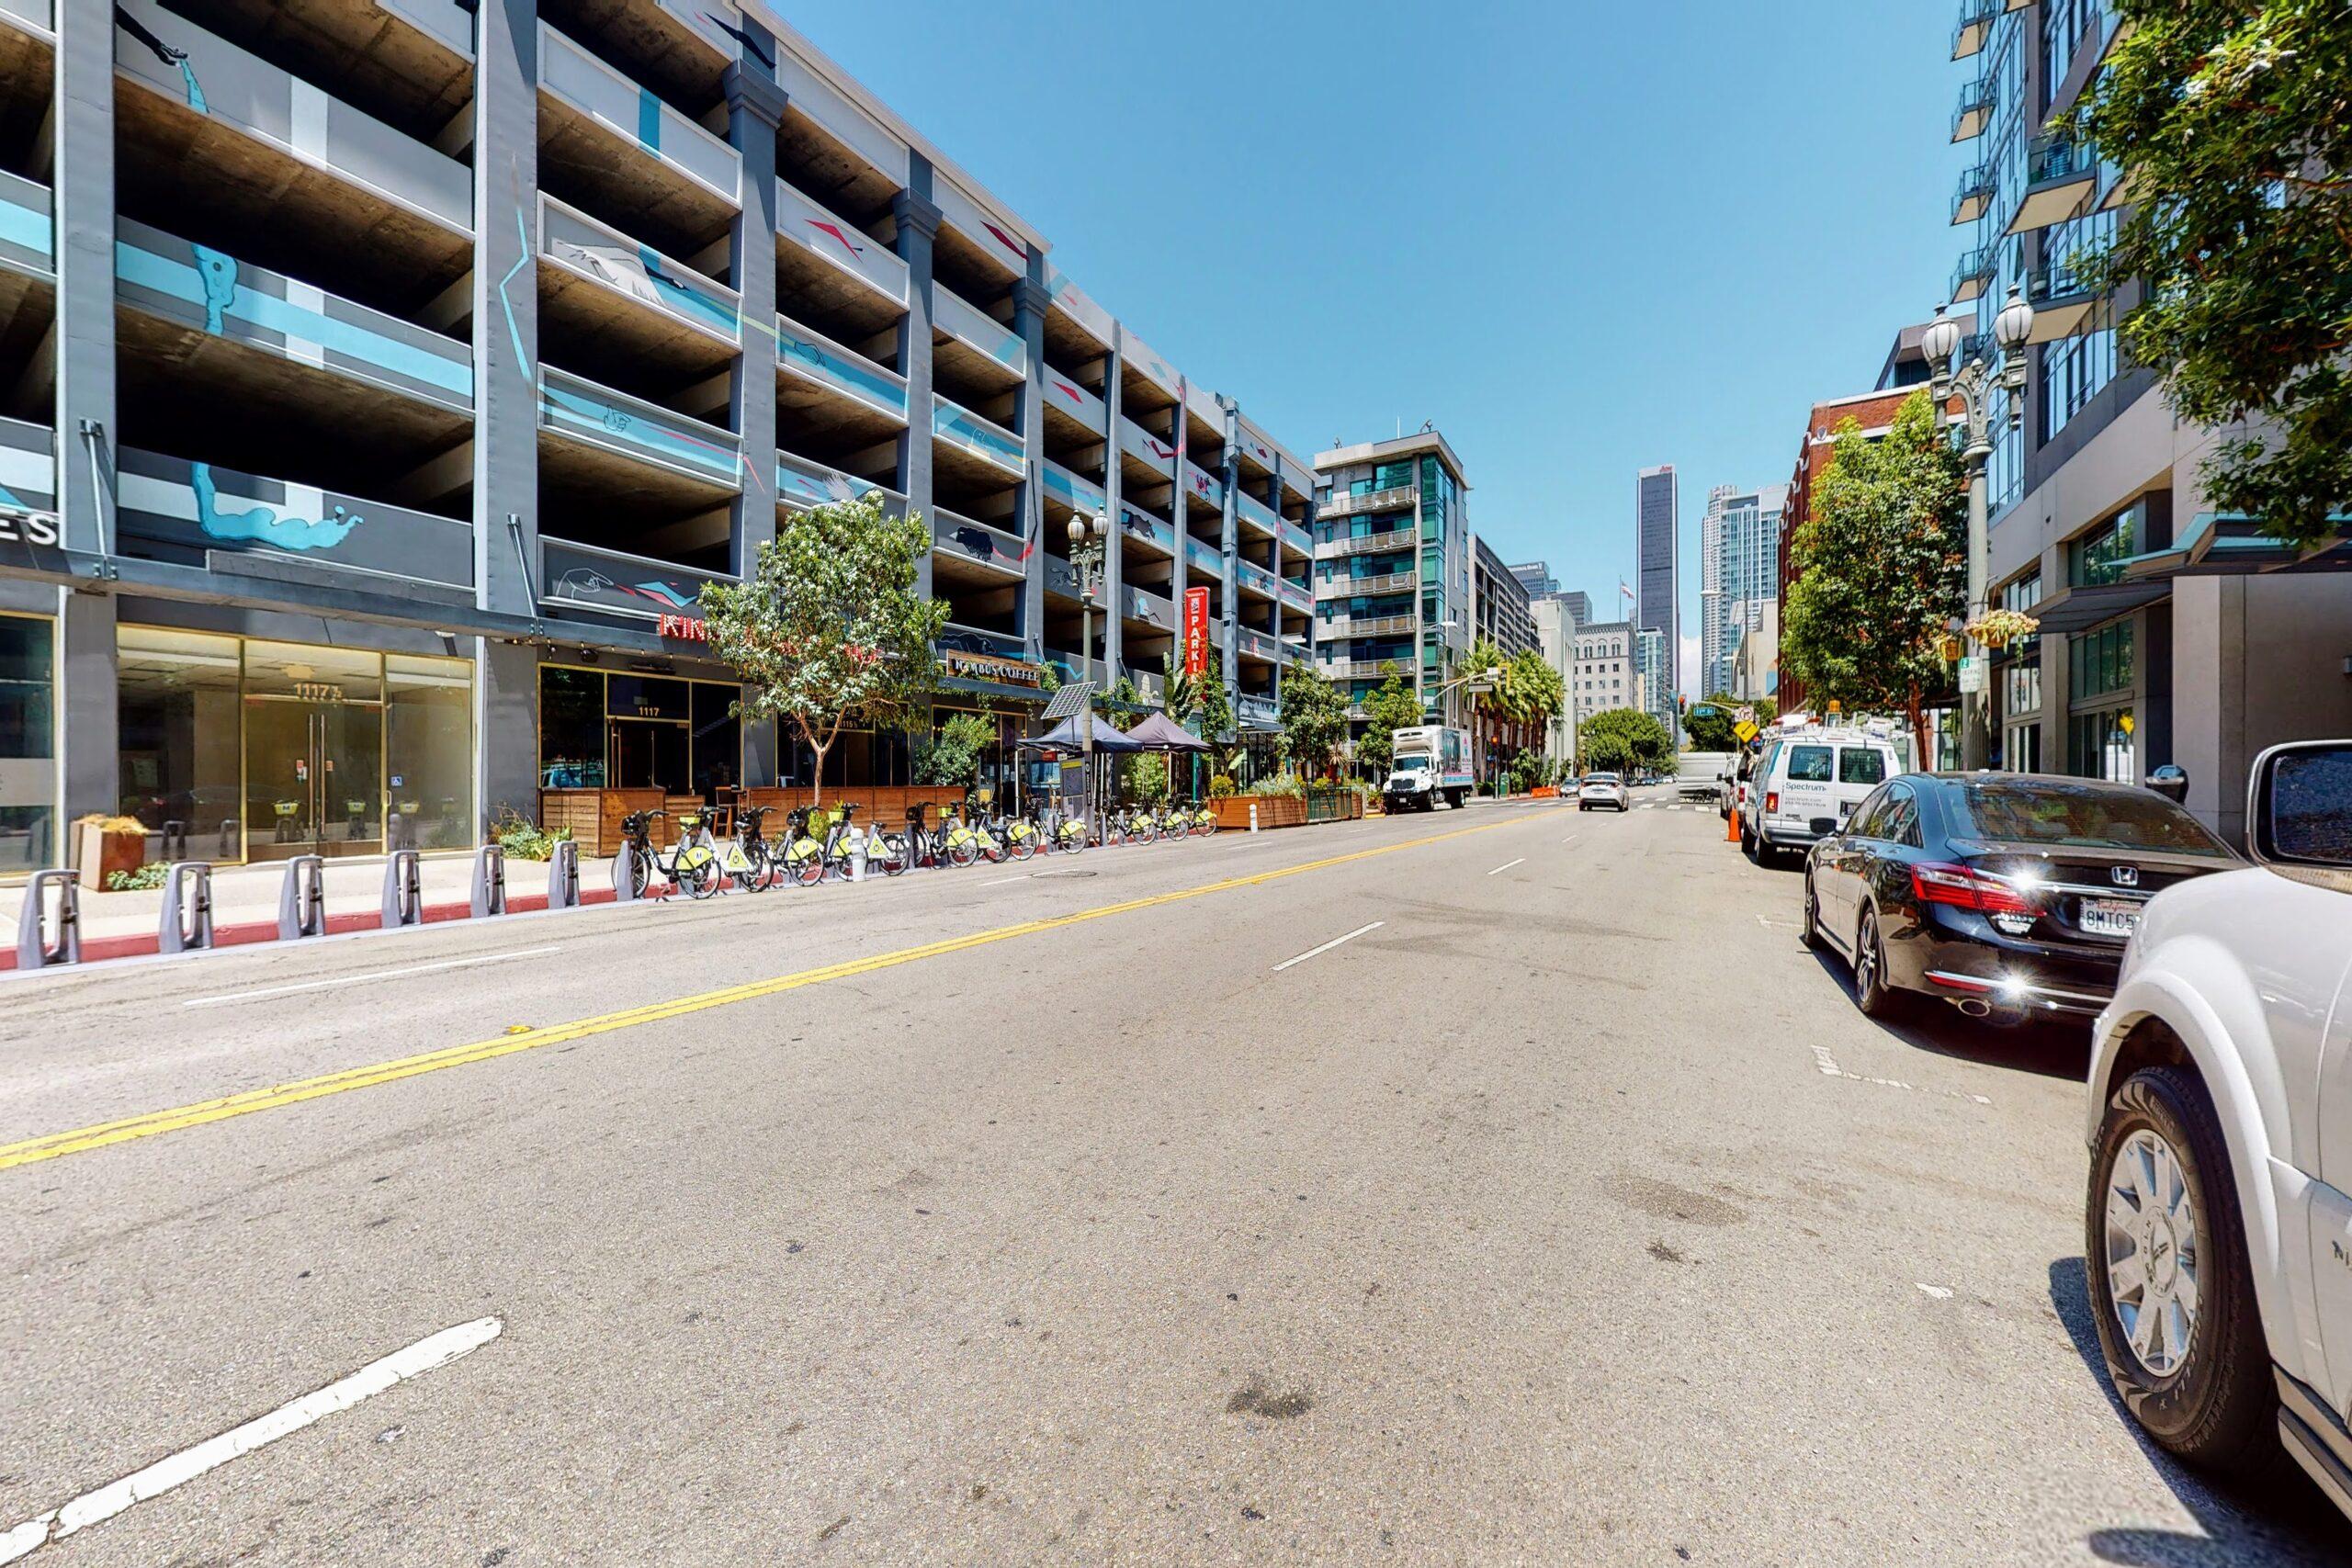 1119 S. Hope St., Los Angeles, CA 90015